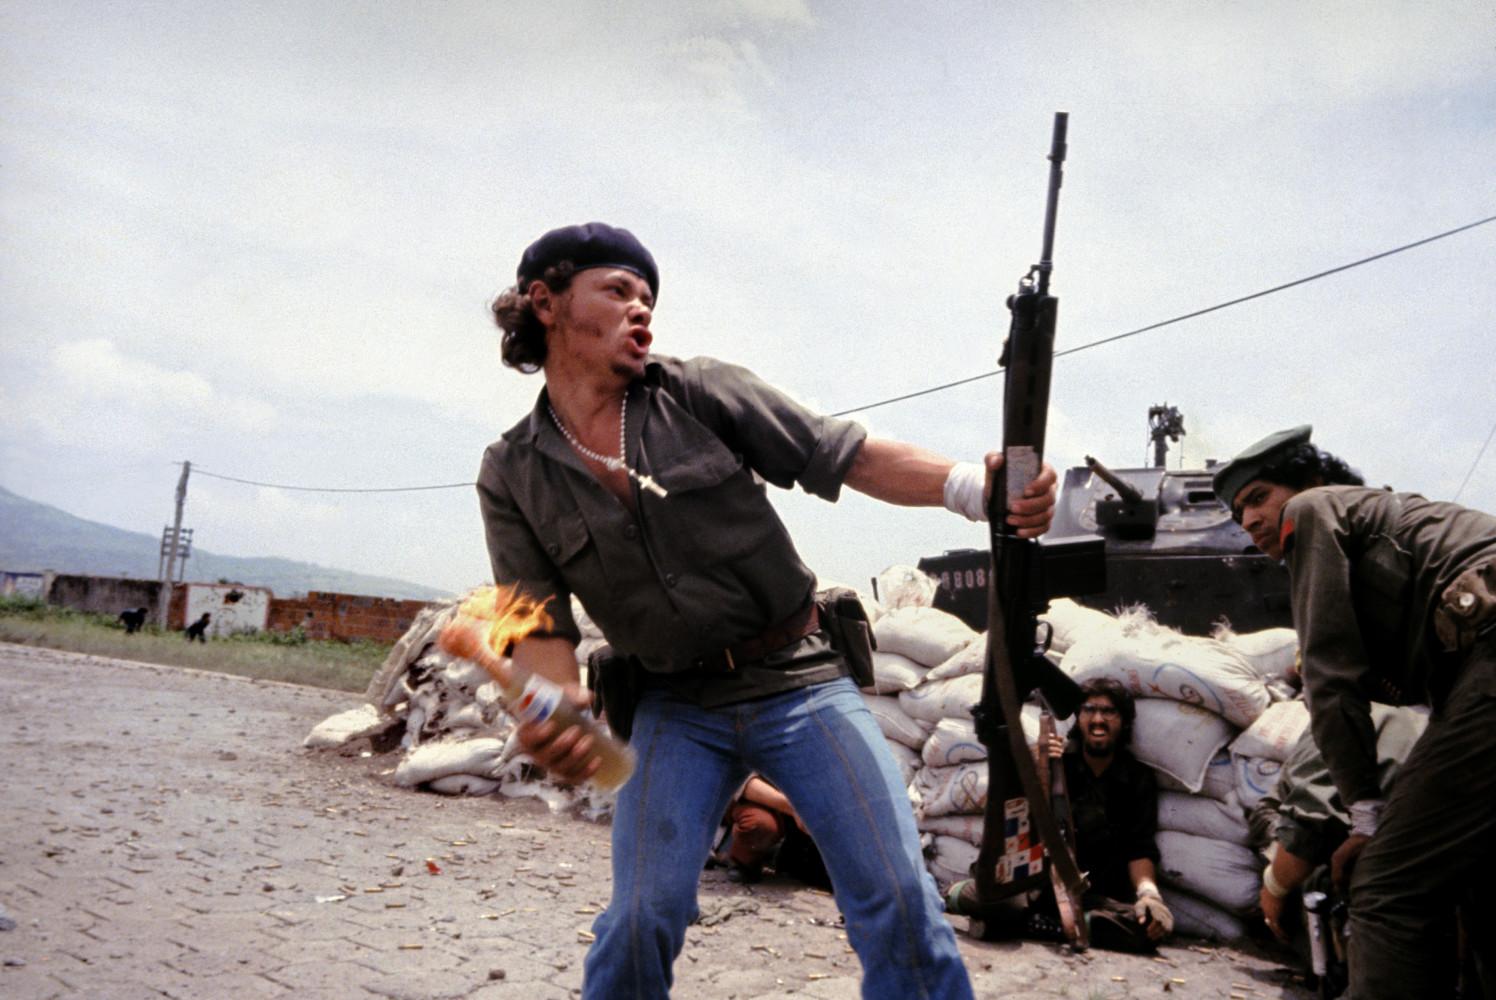 'Molotov Man' -Sandinistas an den Wänden des Hauptquartiers der Esteli National Guard. Juli 1979, Nicaragua © Susan Meiselas